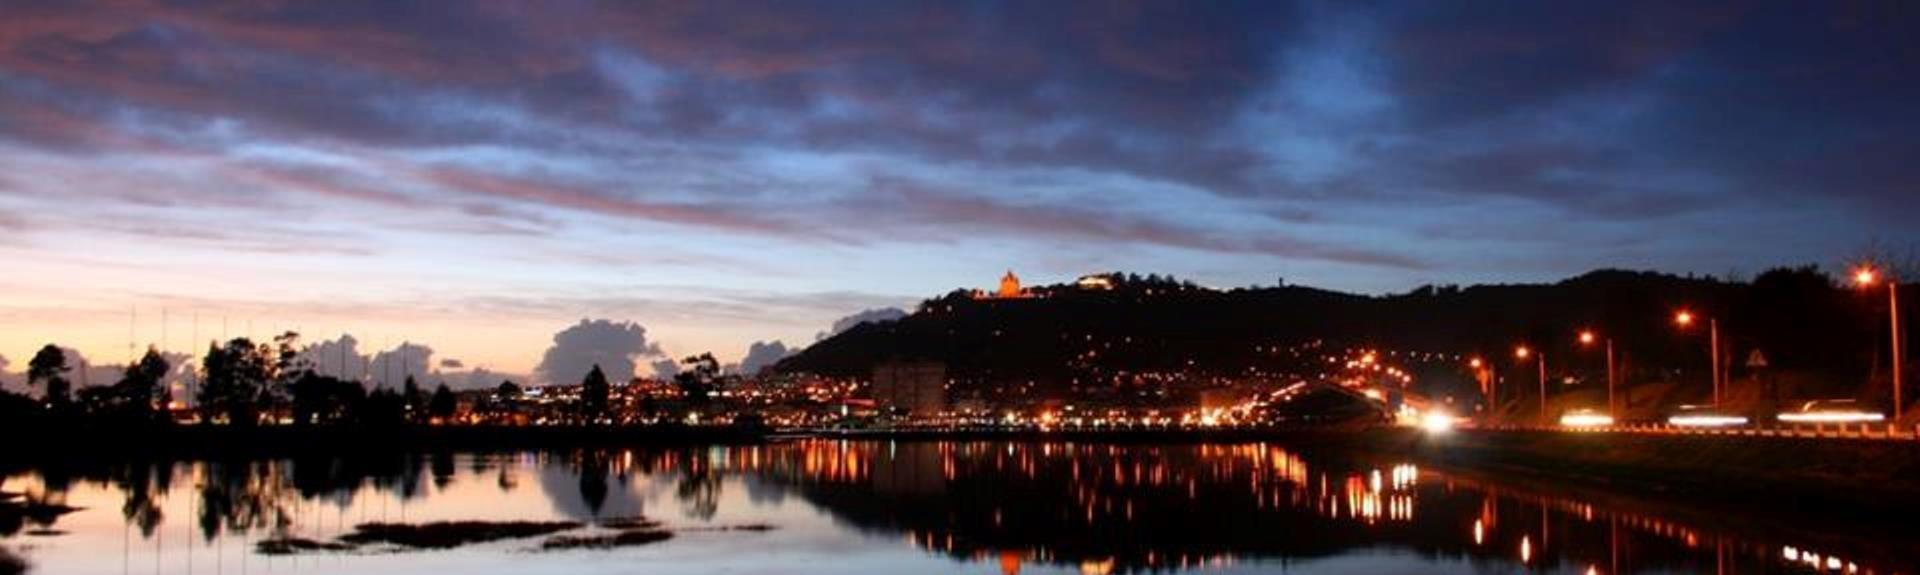 Belinho, Braga District, Portugal